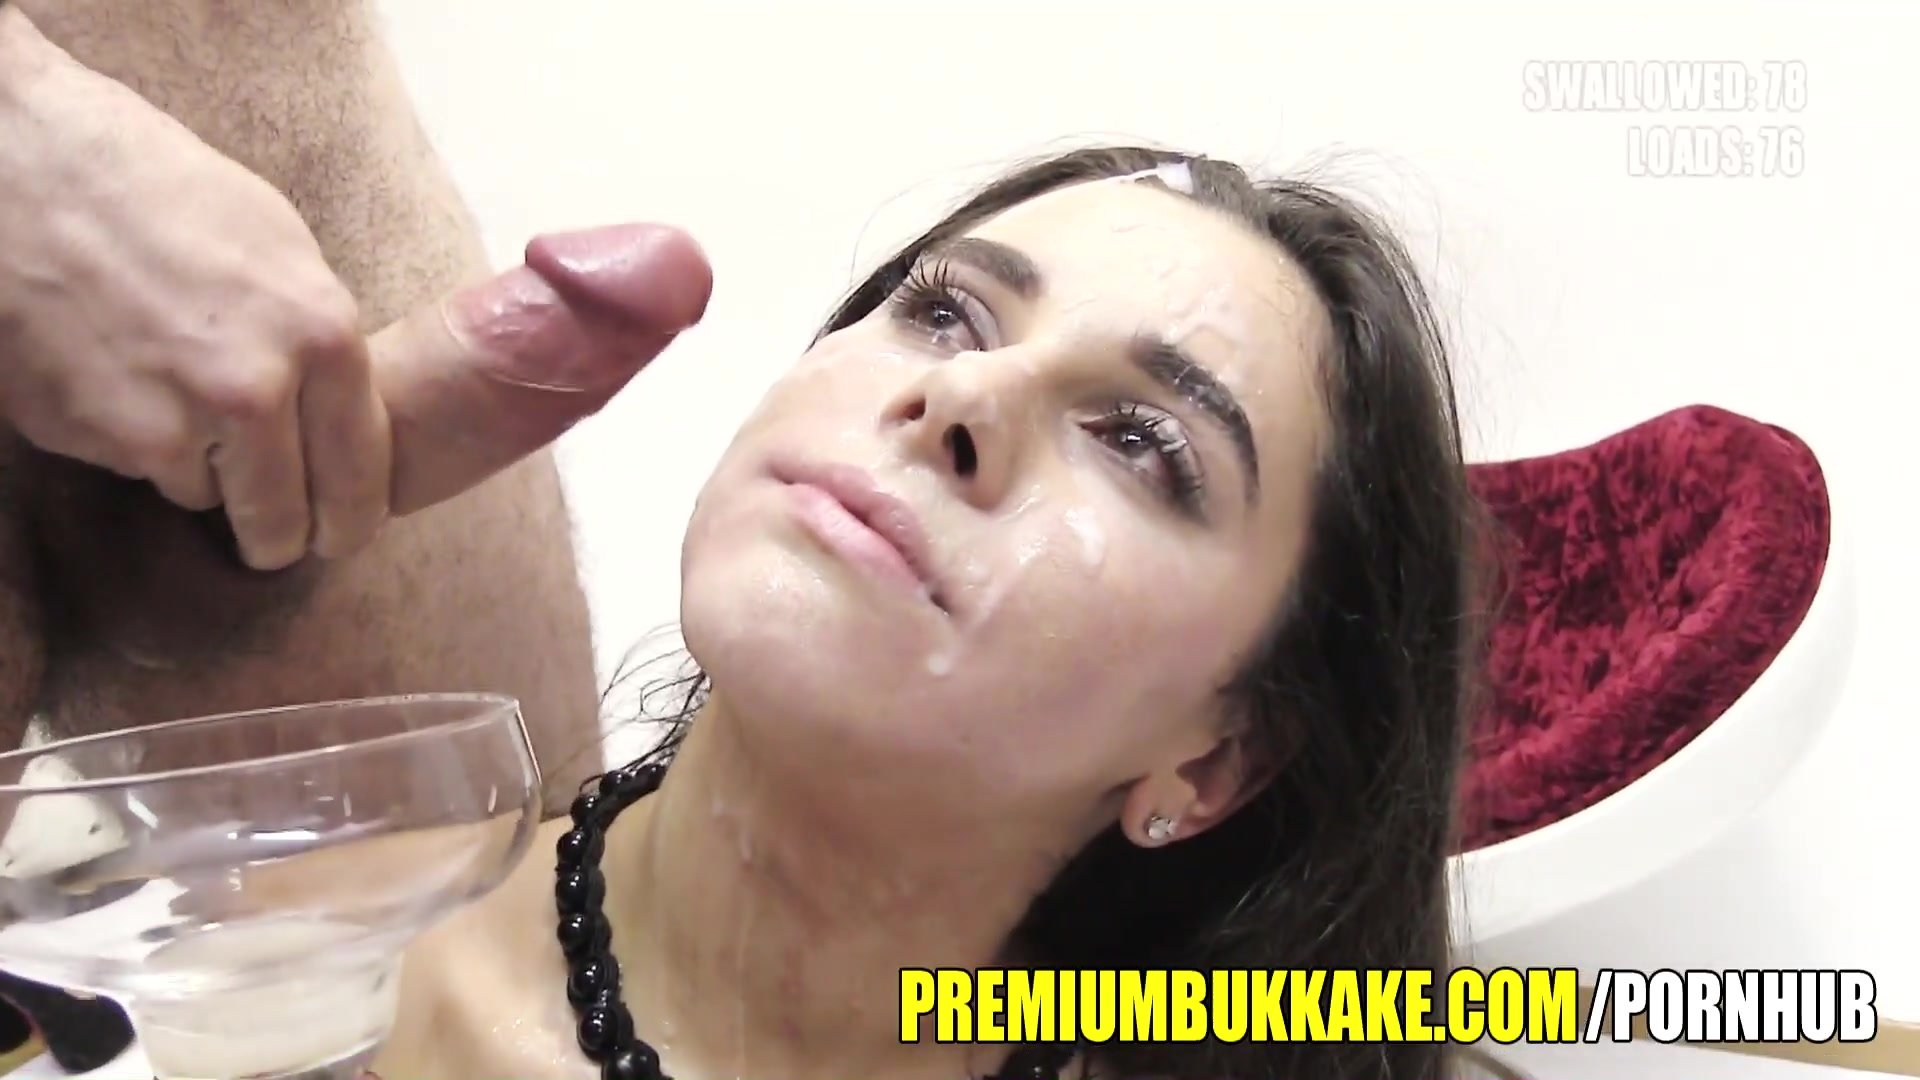 Premium Bukkake - Mary swallows 88 huge mouthful cum loads